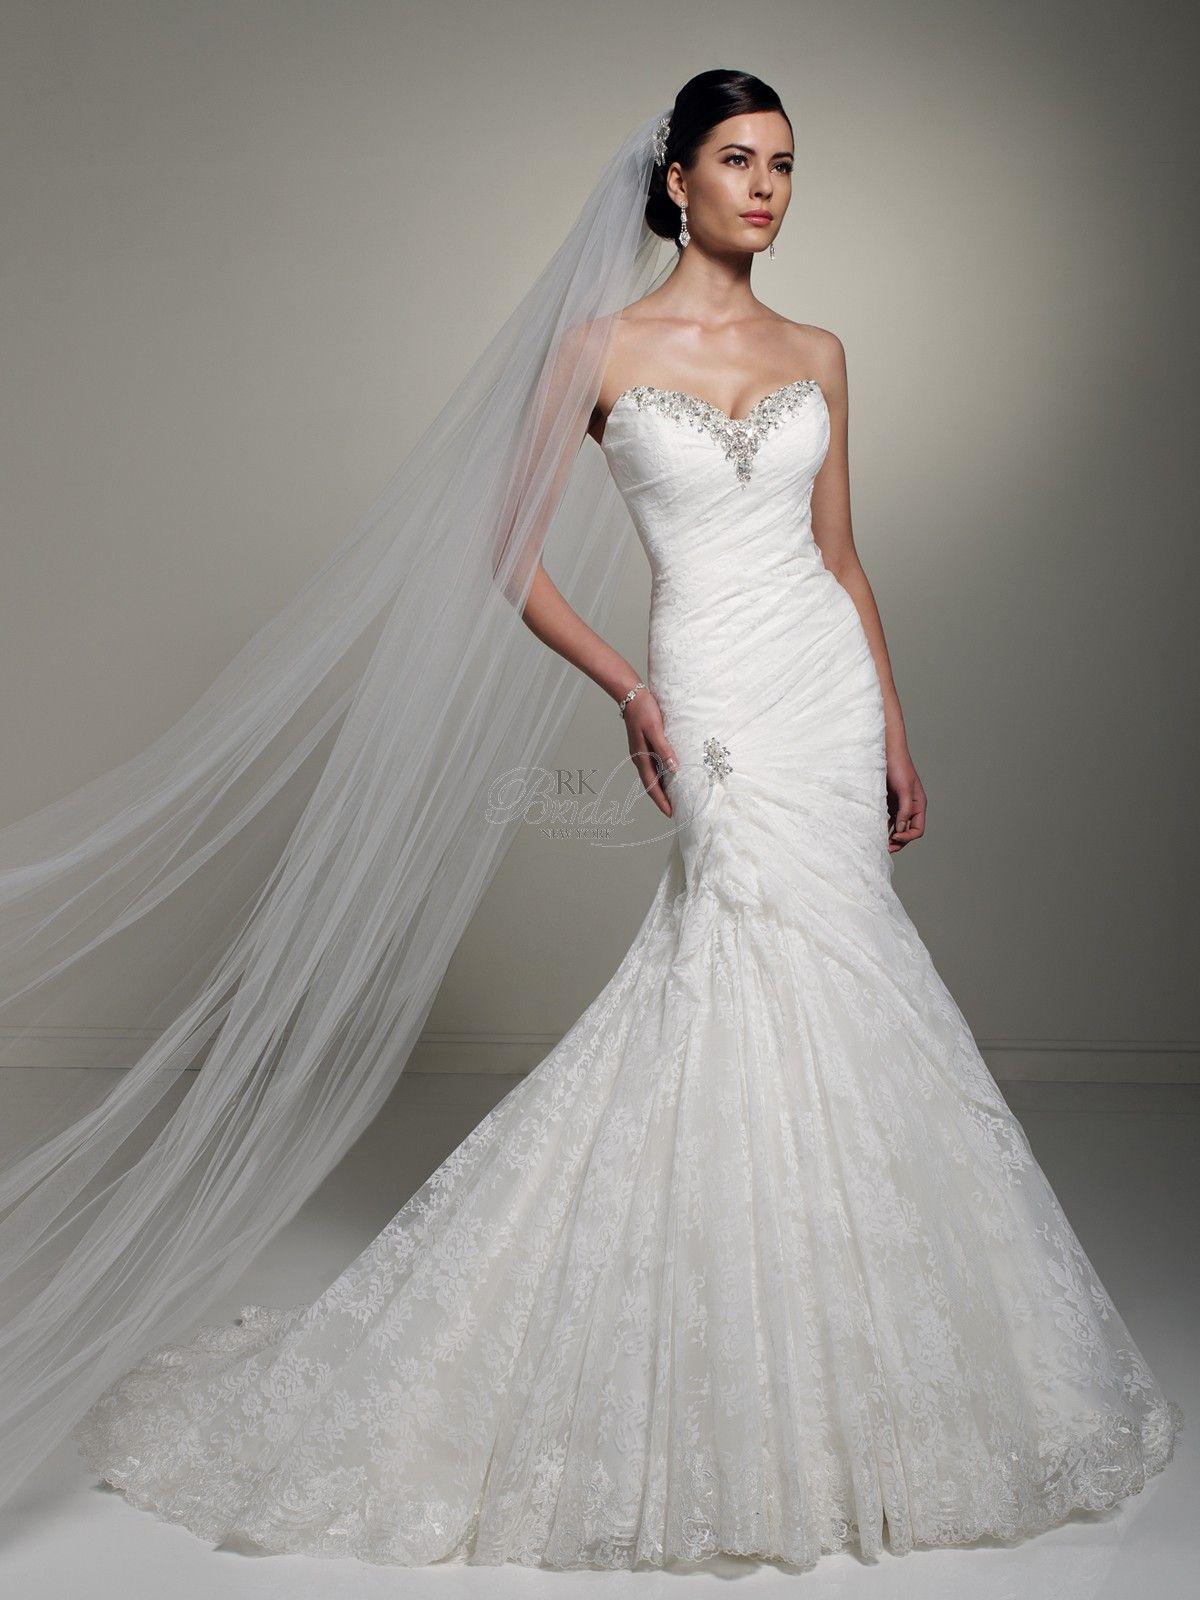 Mori Lee 1862 Maggie Sottero Phillipa Vs Help Wedding Fashion